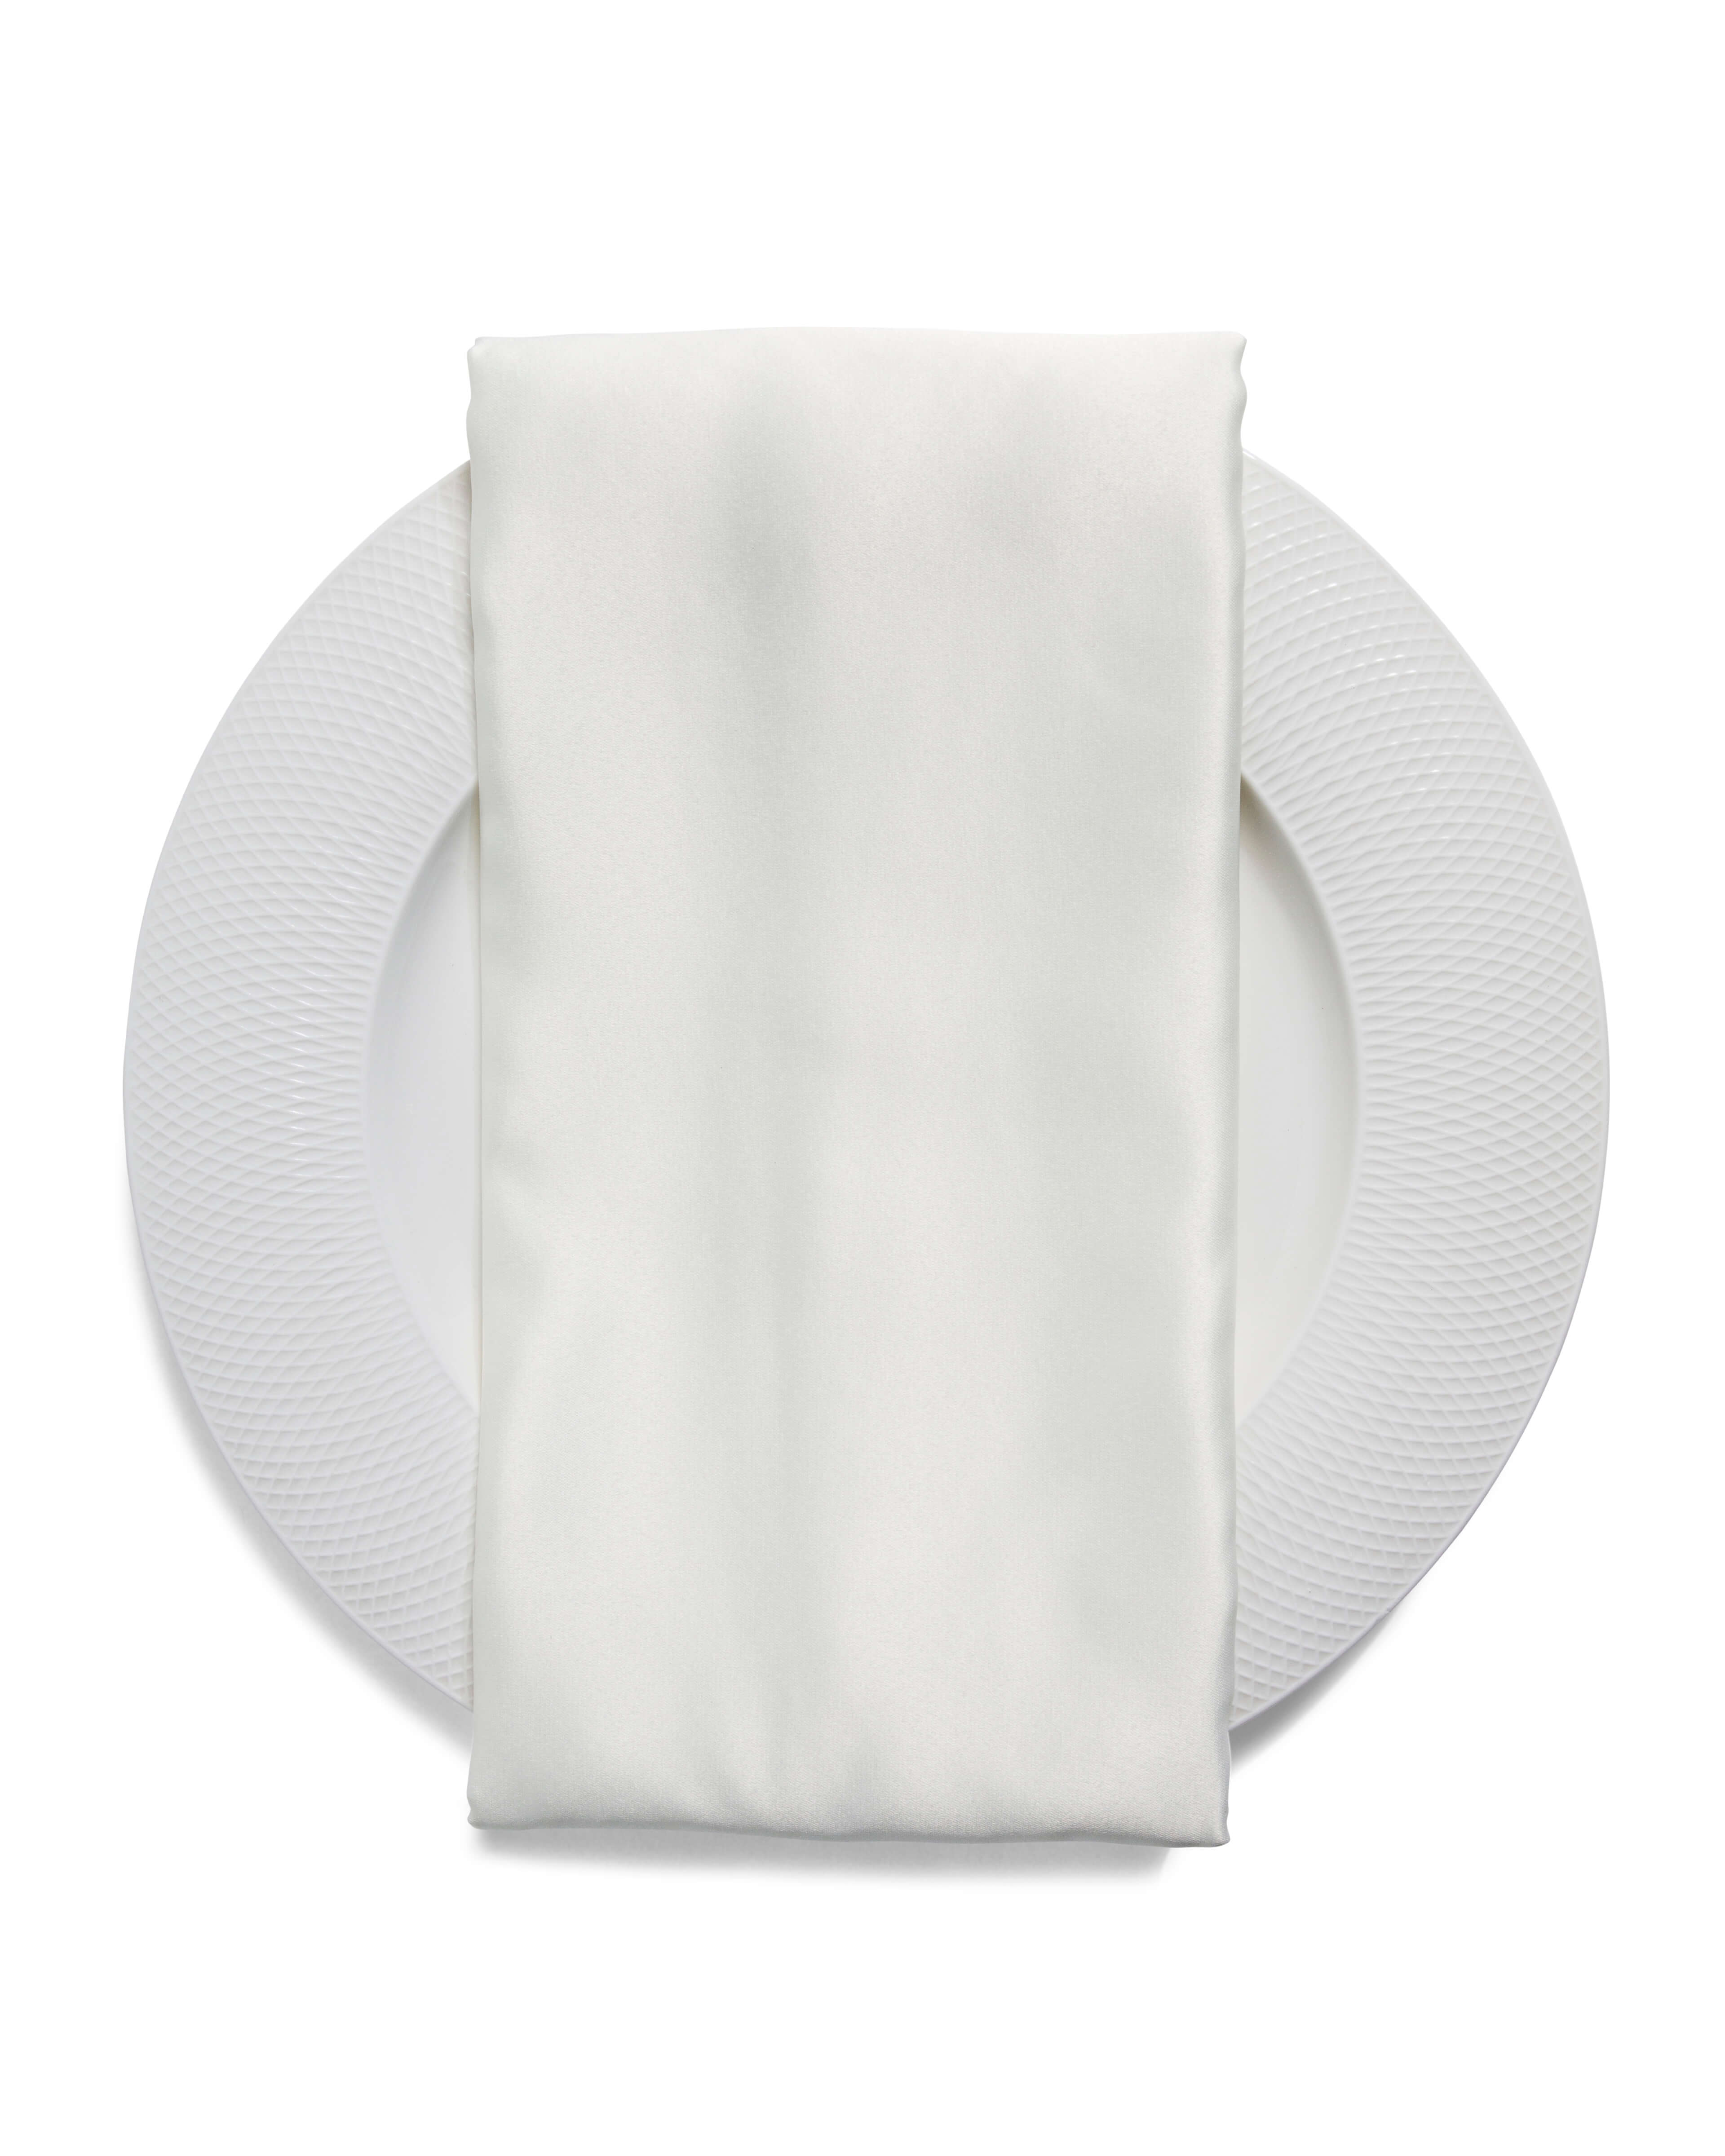 ivory satin napkin rental